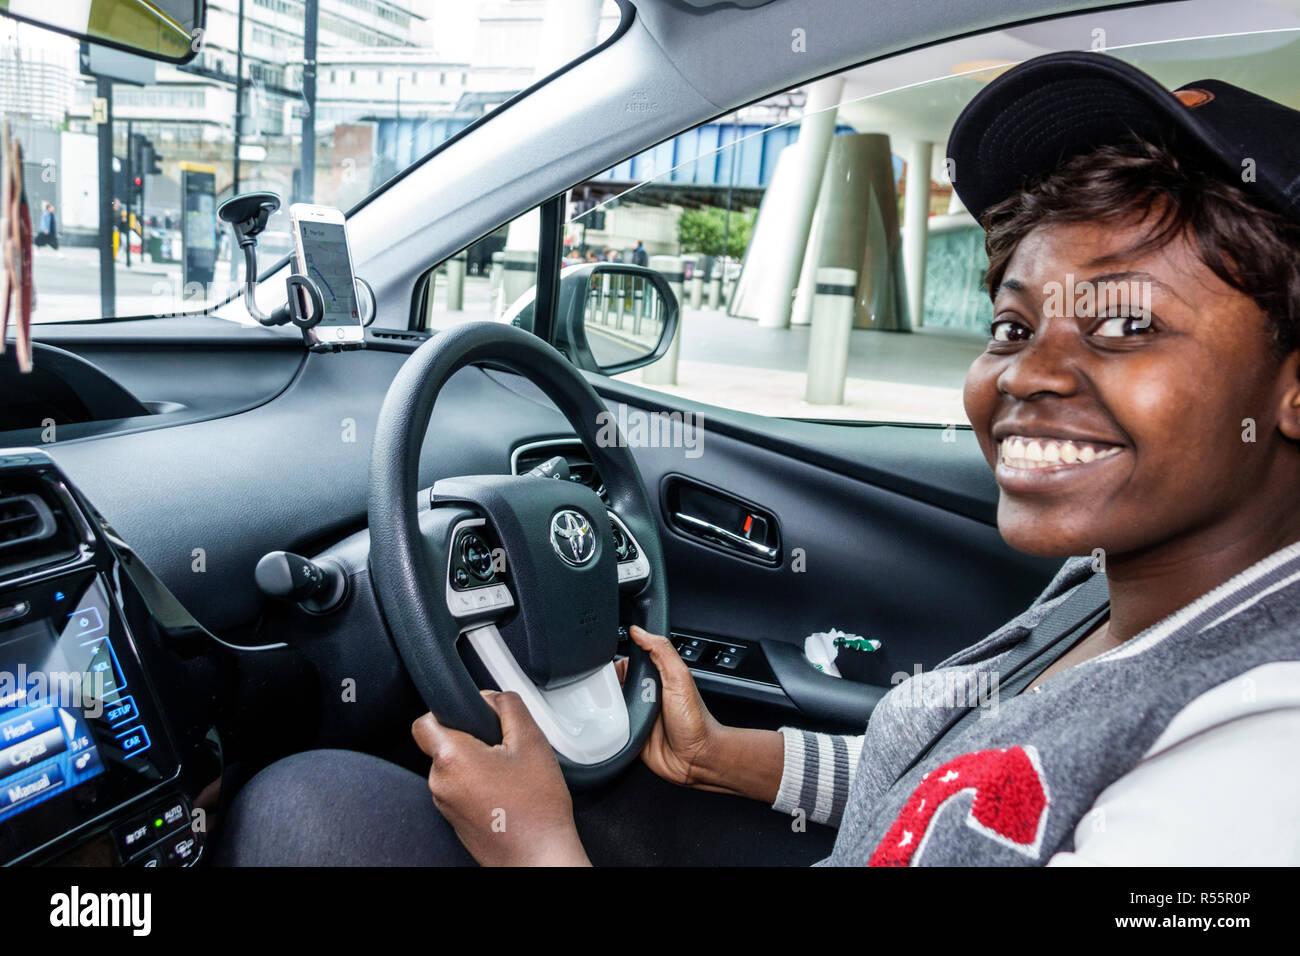 United Kingdom Great Britain England London Southwark uber driver driving car interior inside steering wheel Black woman smiling working - Stock Image